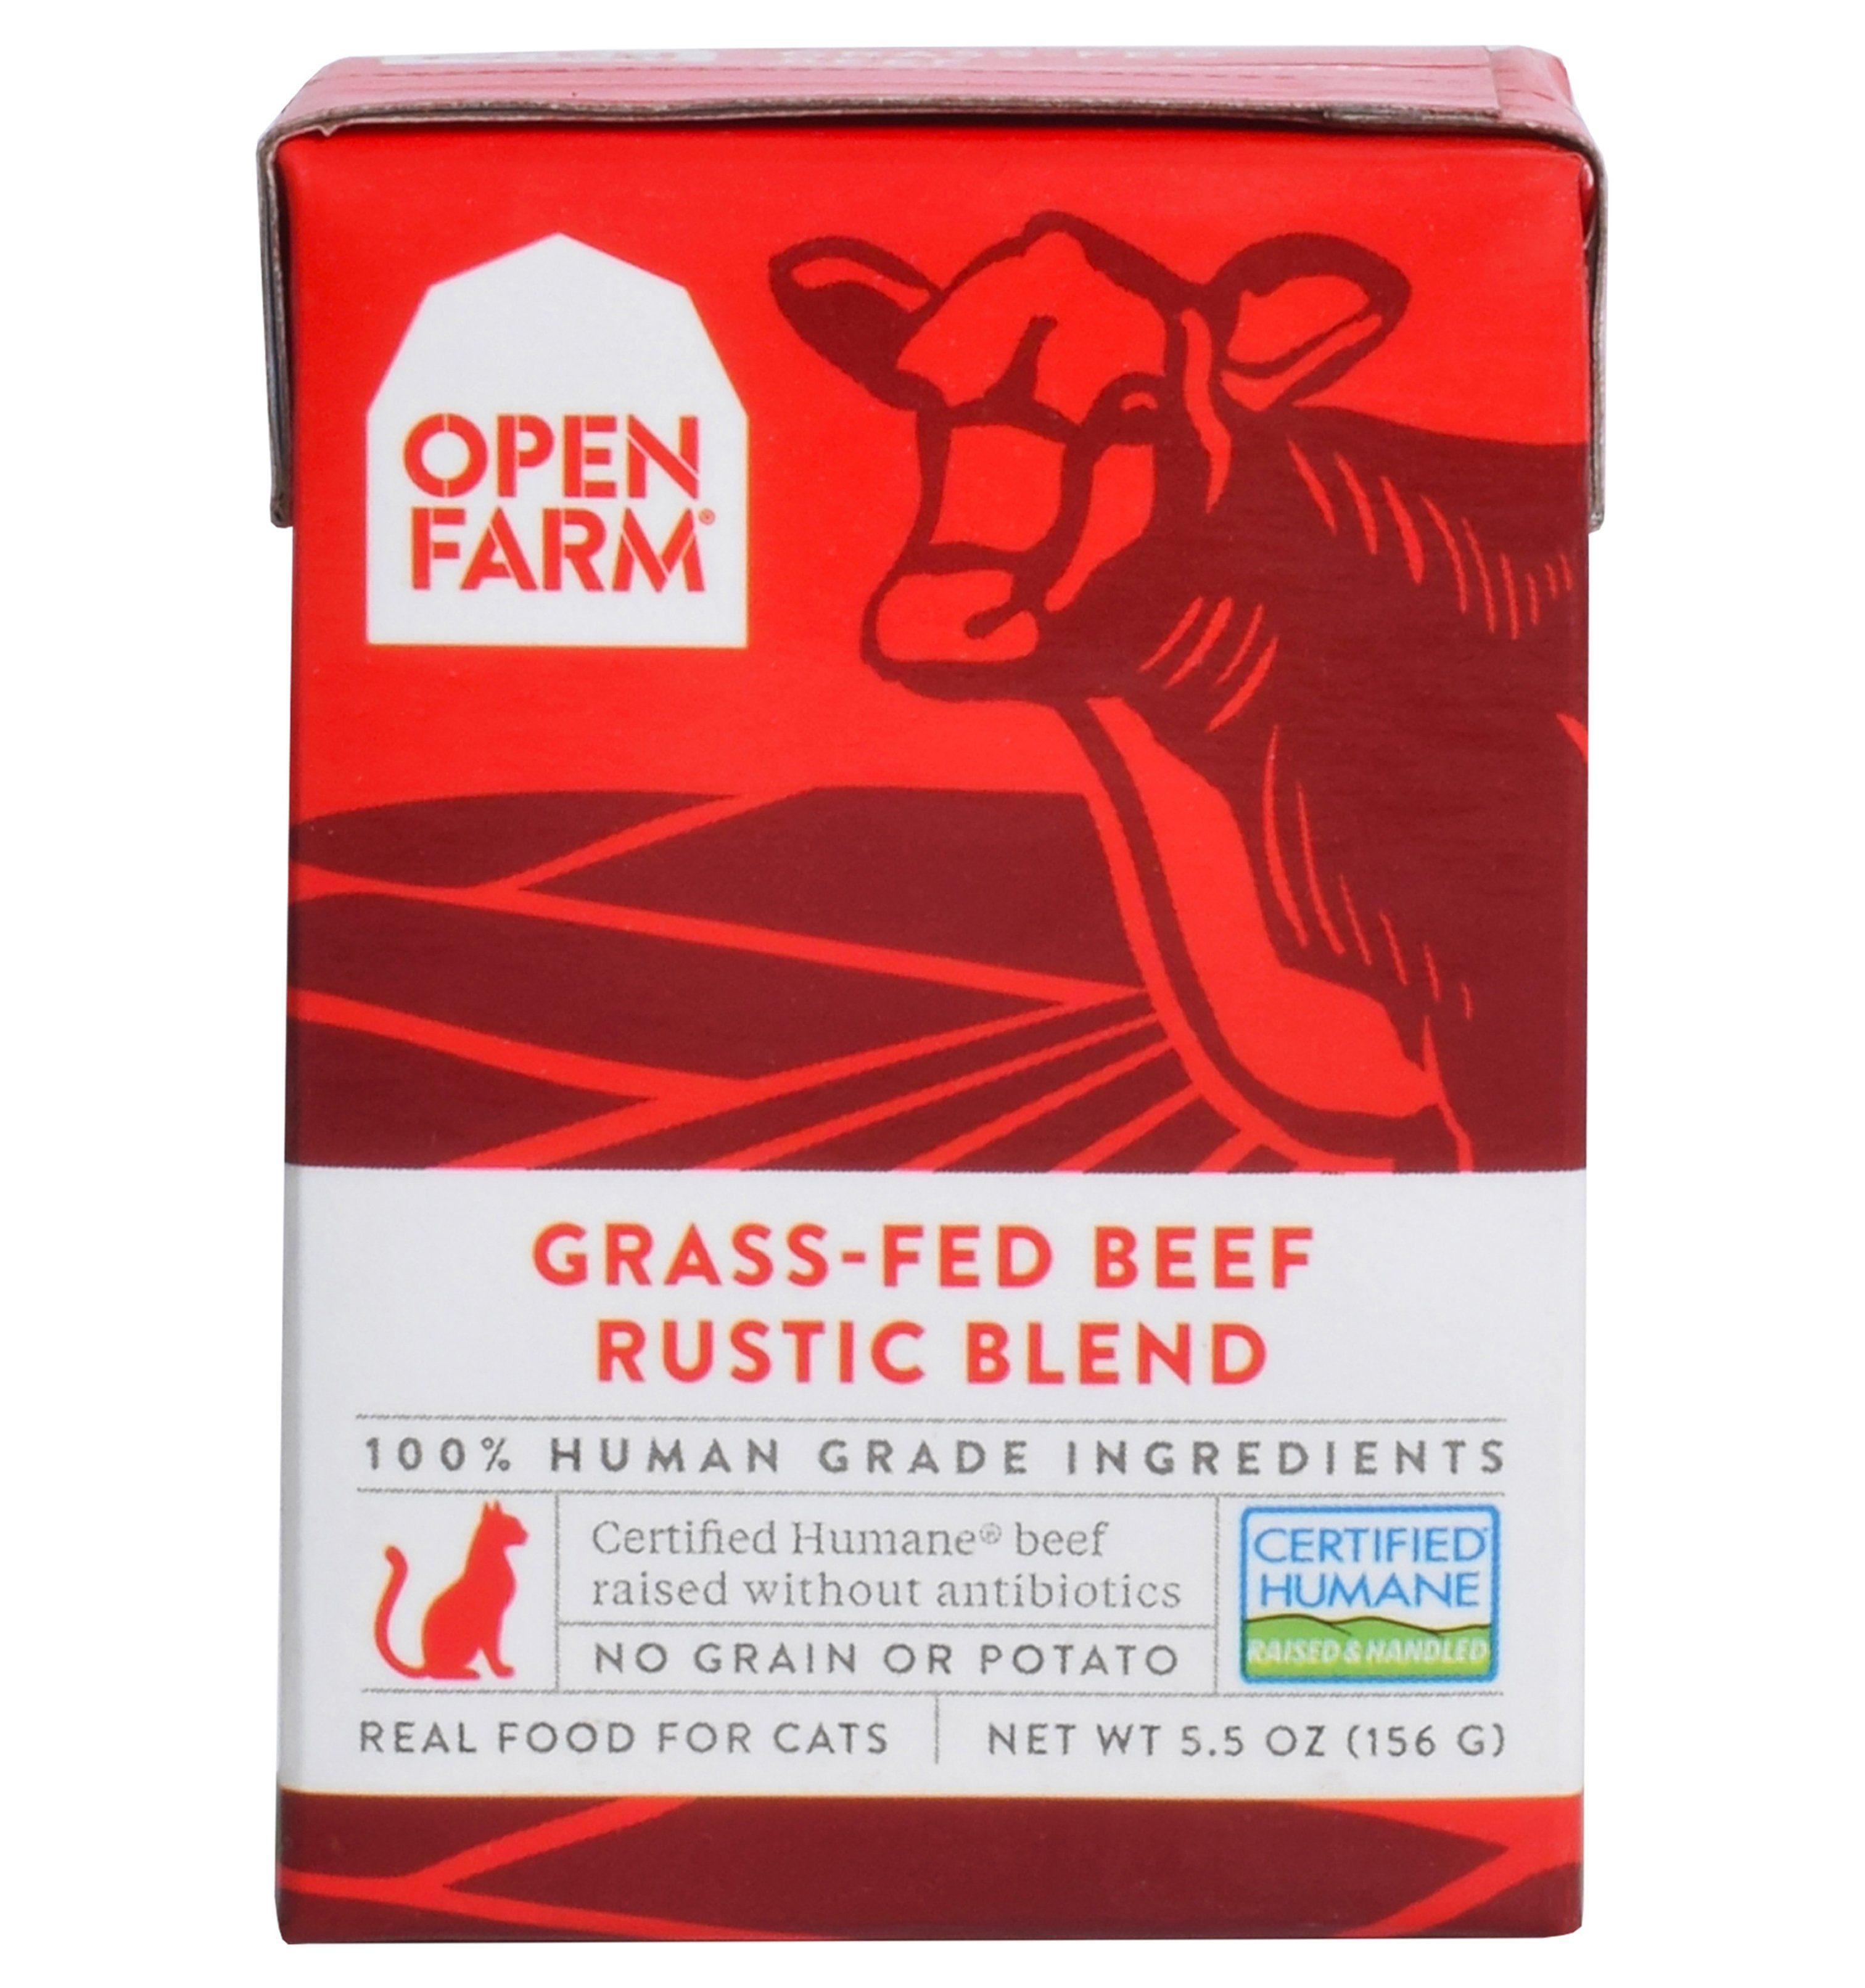 Open farm grassfed beef rustic blend grass fed beef beef